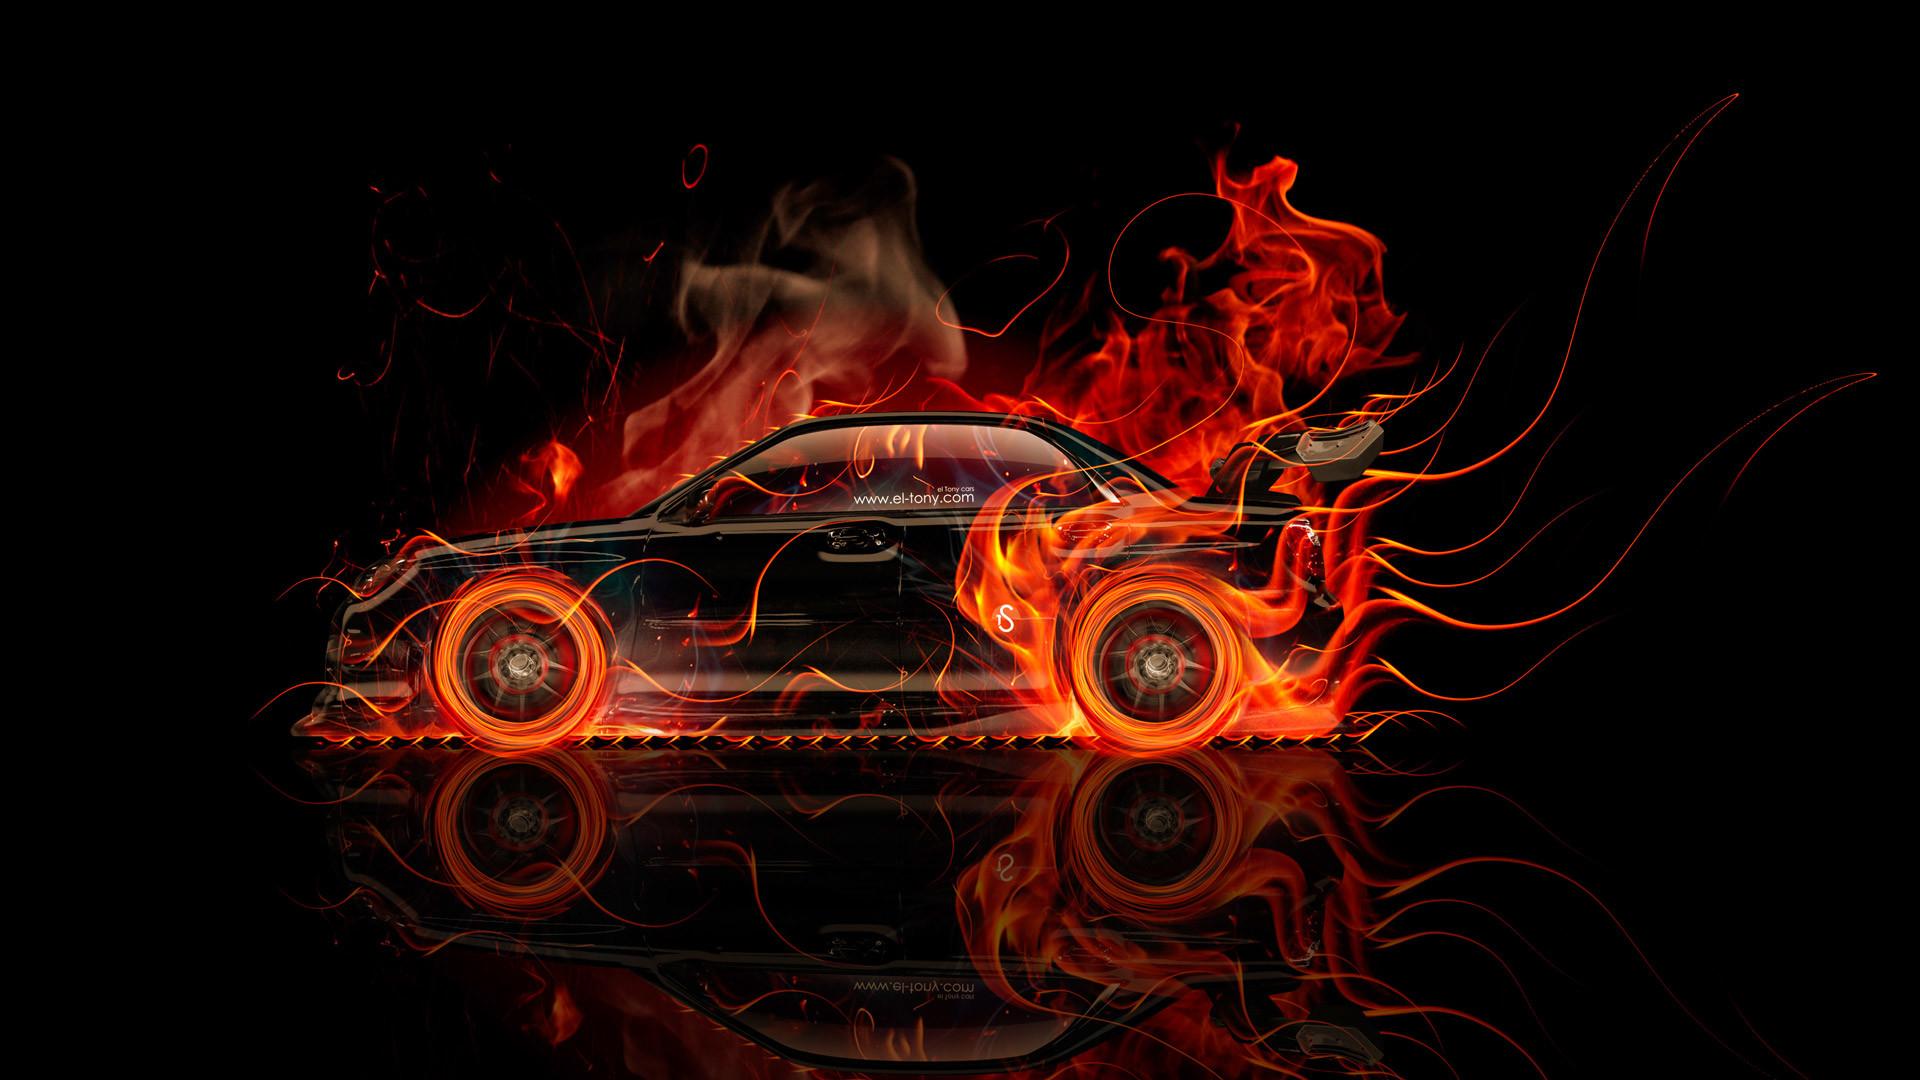 "Res: 1920x1080, ""Subaru-Impreza-WRX-STI-Side-Fire-Abstract-Car-2014-HD-Wallpapers-design-by-Tony-Kokhan-www.el-tony.com_.jpg  (1920×1080) Subaru Impreza WRX STI Side Fire ..."